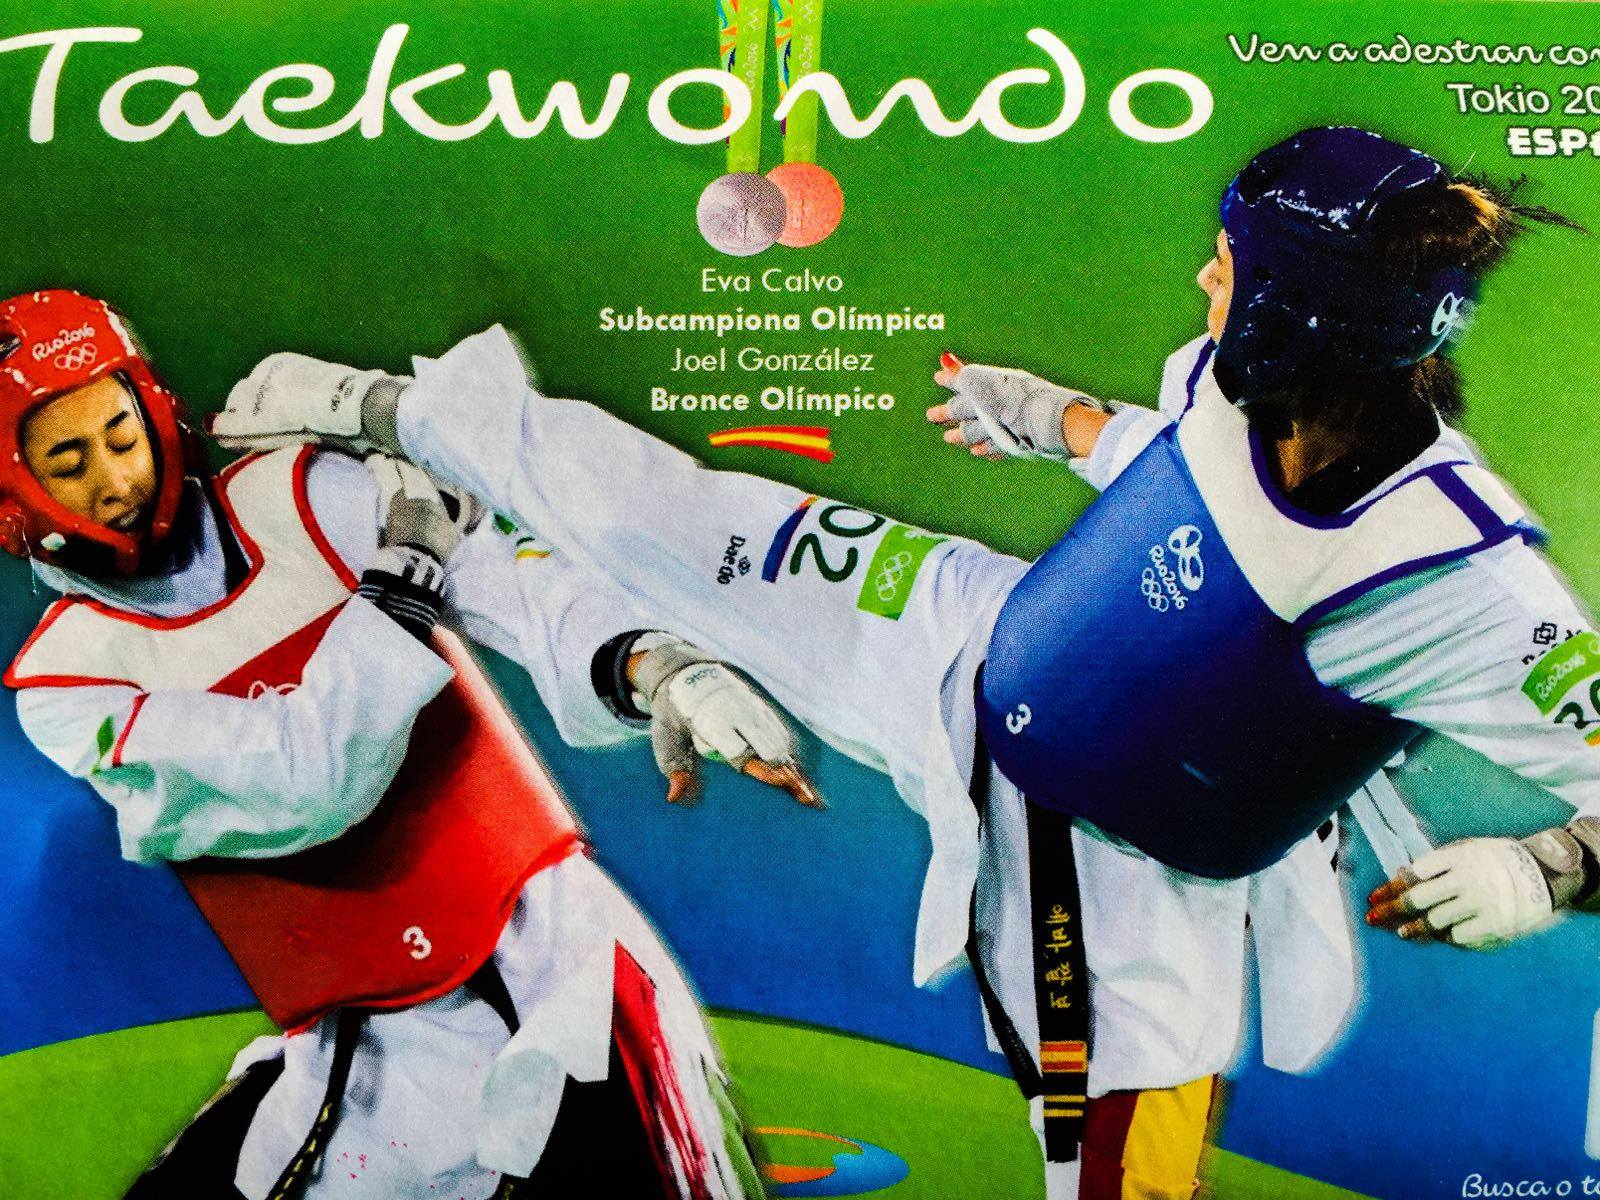 Entrenadores Taekwondo Termopilas Fitness Gym